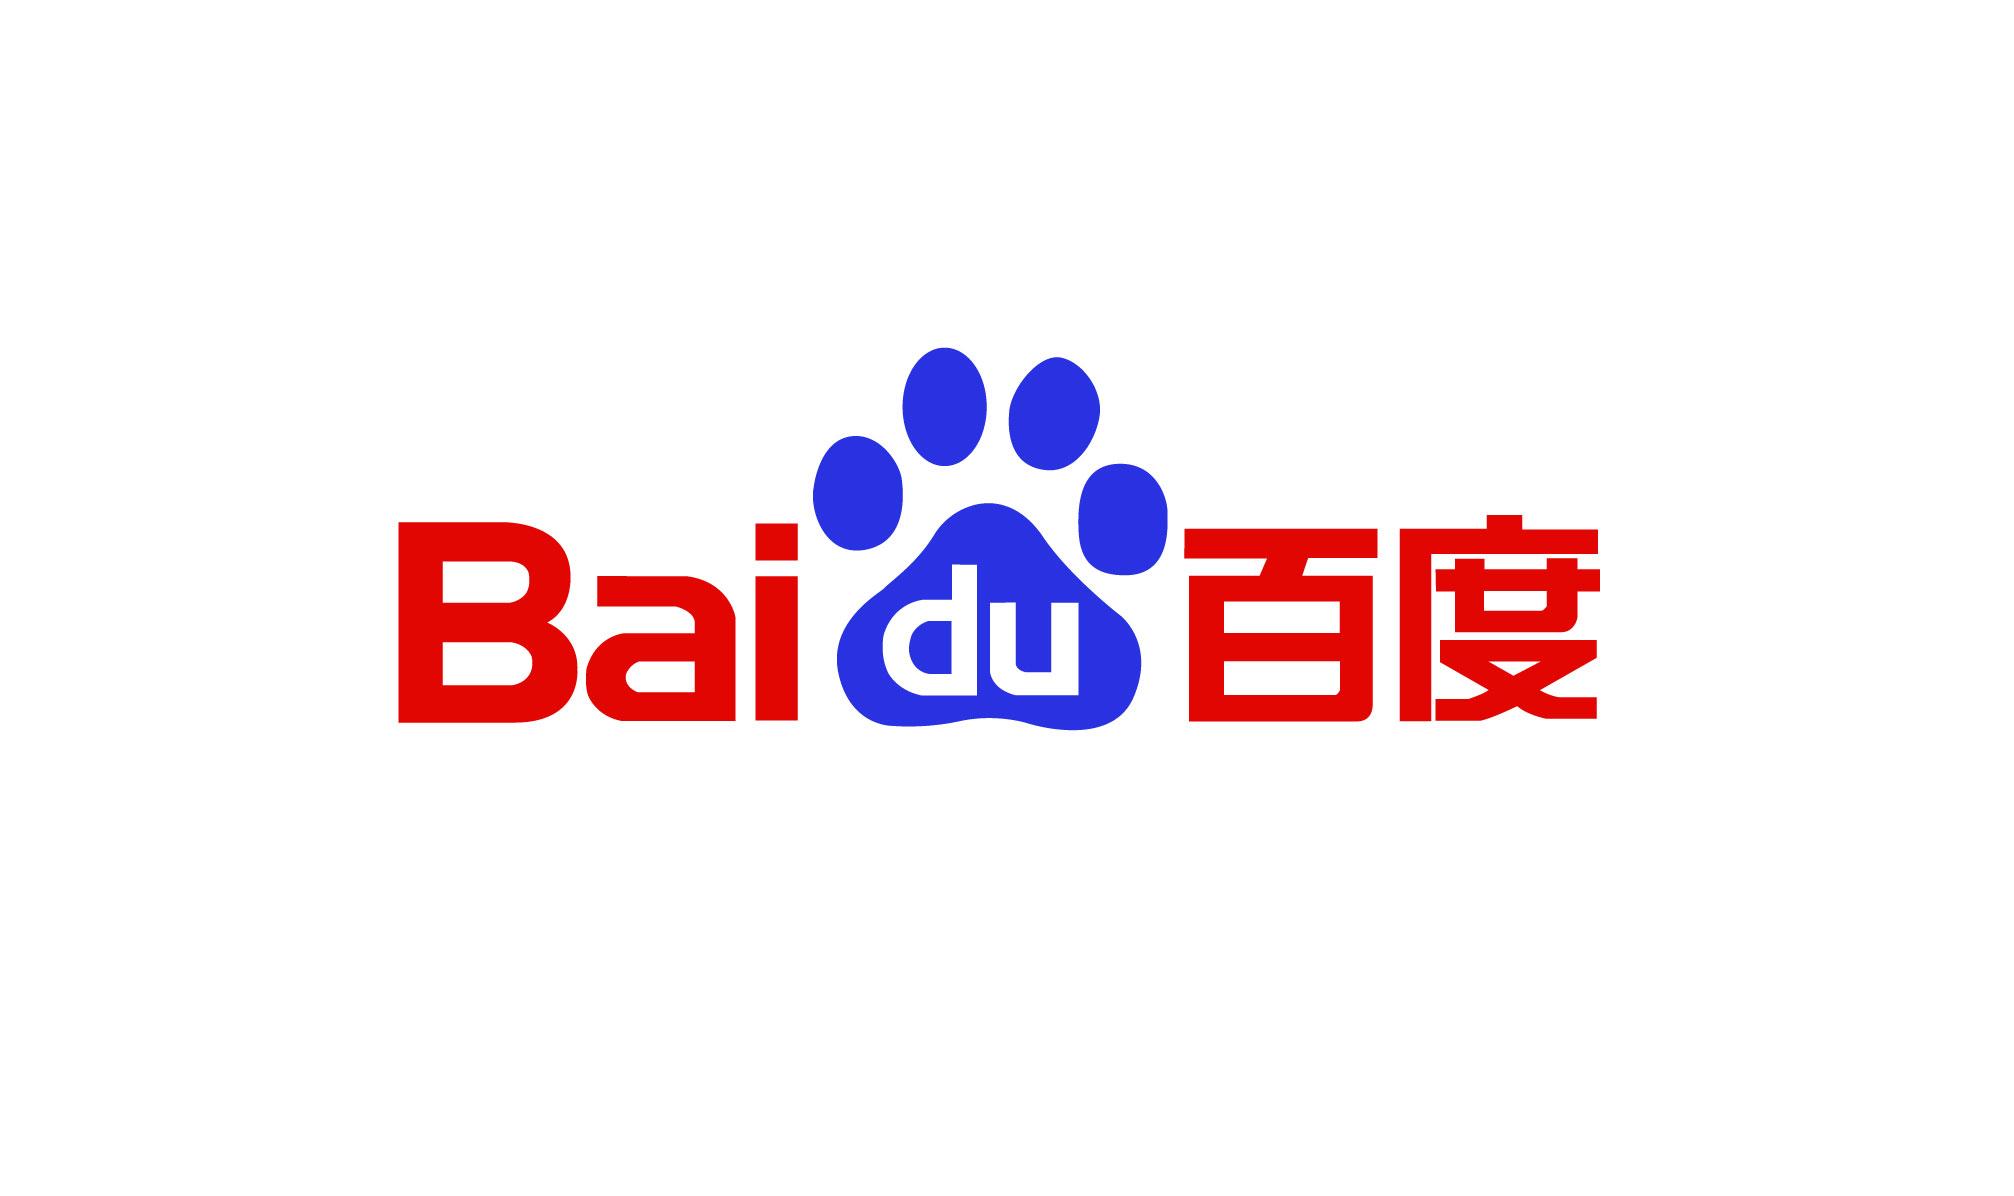 Victory Capital Management Inc. Has $7.66 Million Holdings in Baidu, Inc. (BIDU)